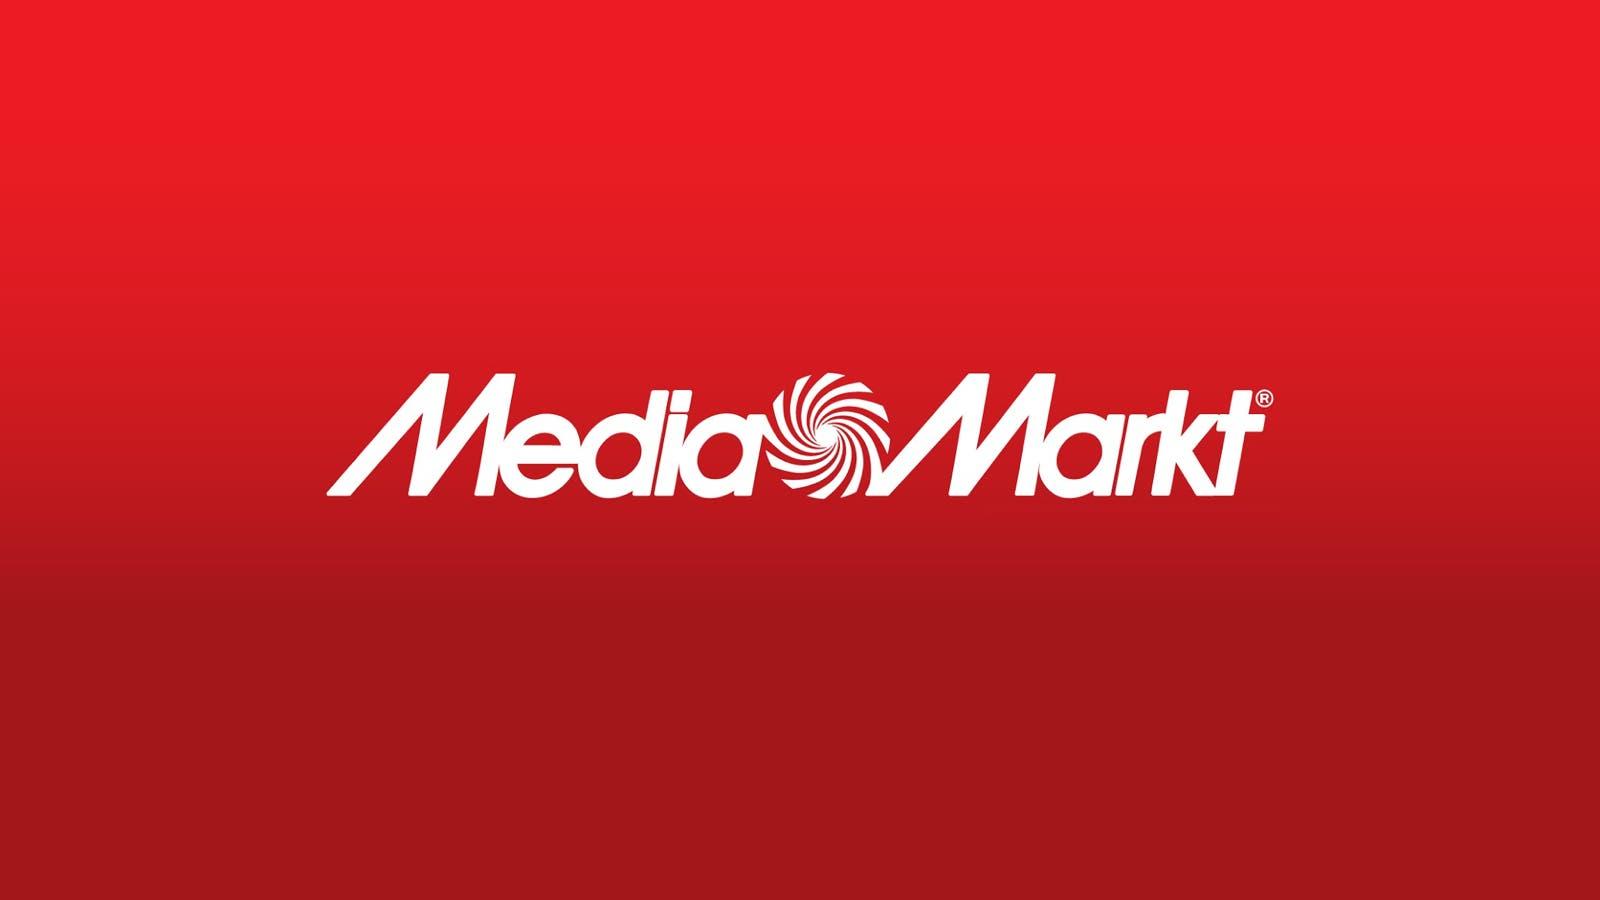 Logo de MediaMarkt en blanco sobre fondo degradado rojo